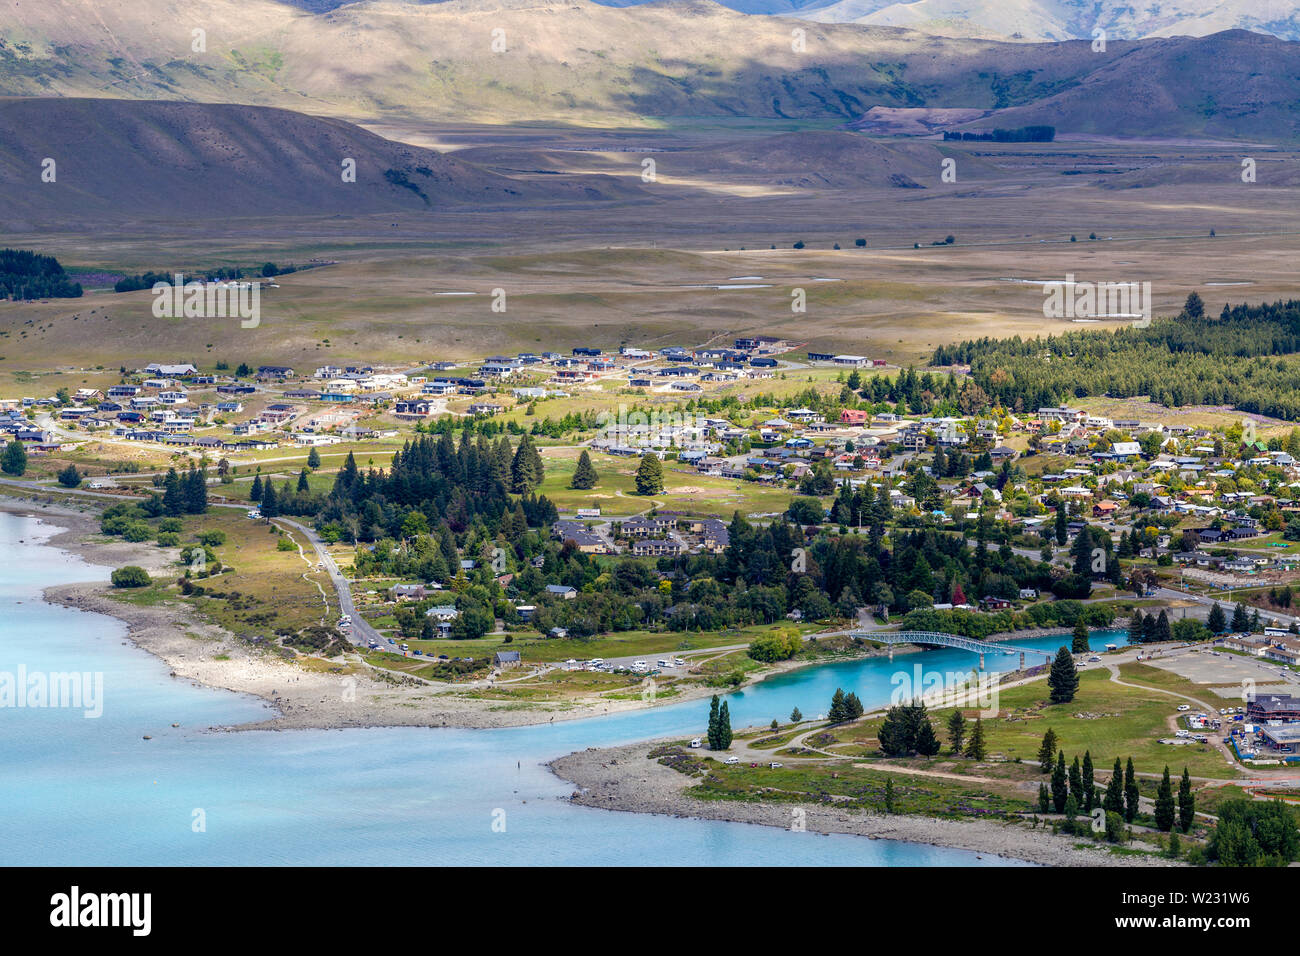 Lake Tekapo Town and Lake Tekapo, Canterbury Region, South Island, New Zealand Stock Photo